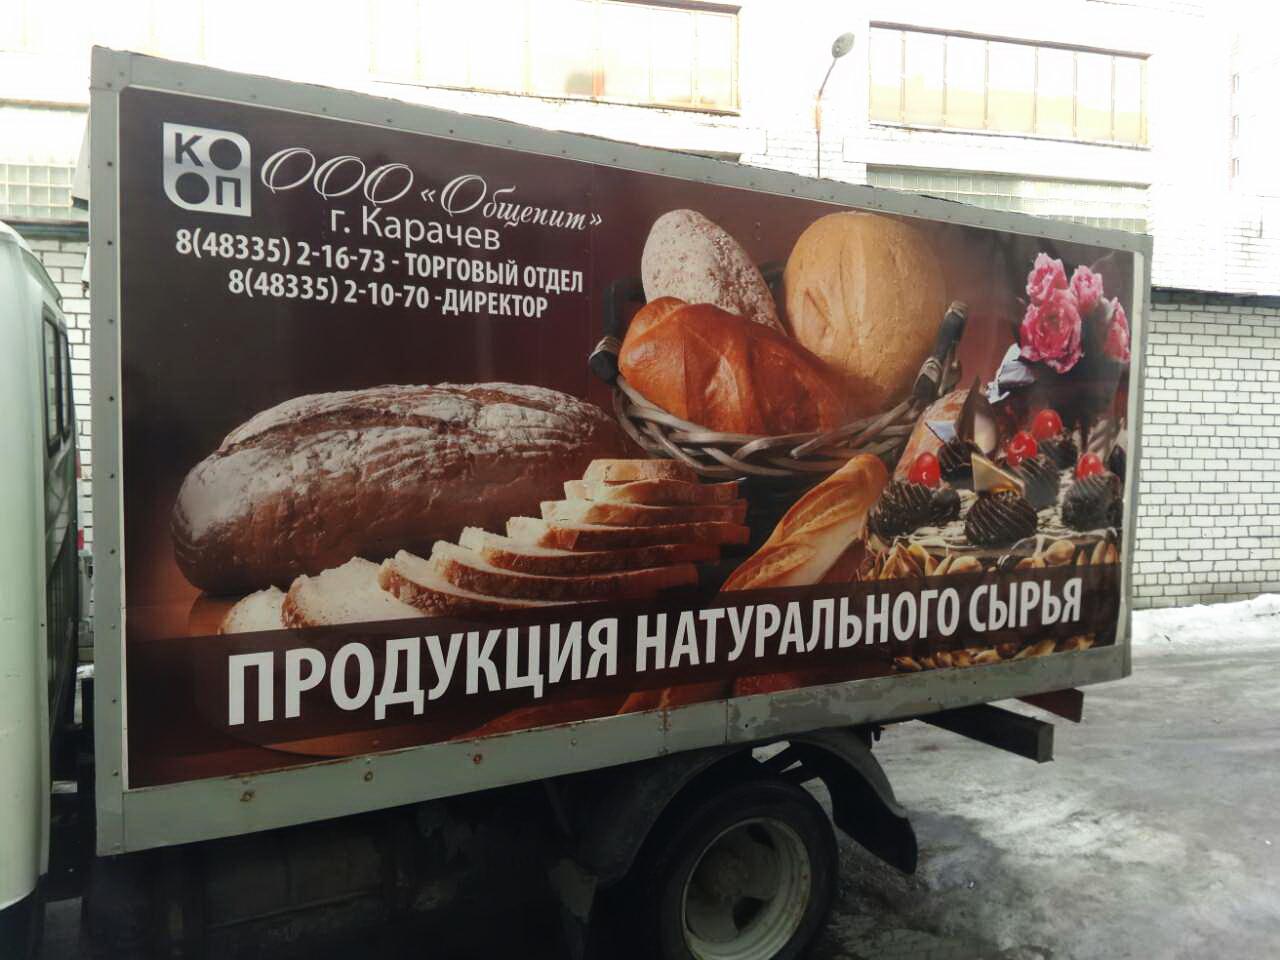 КООП, Карачев, реклама на авто, брендирование, Вавилон-32, 1